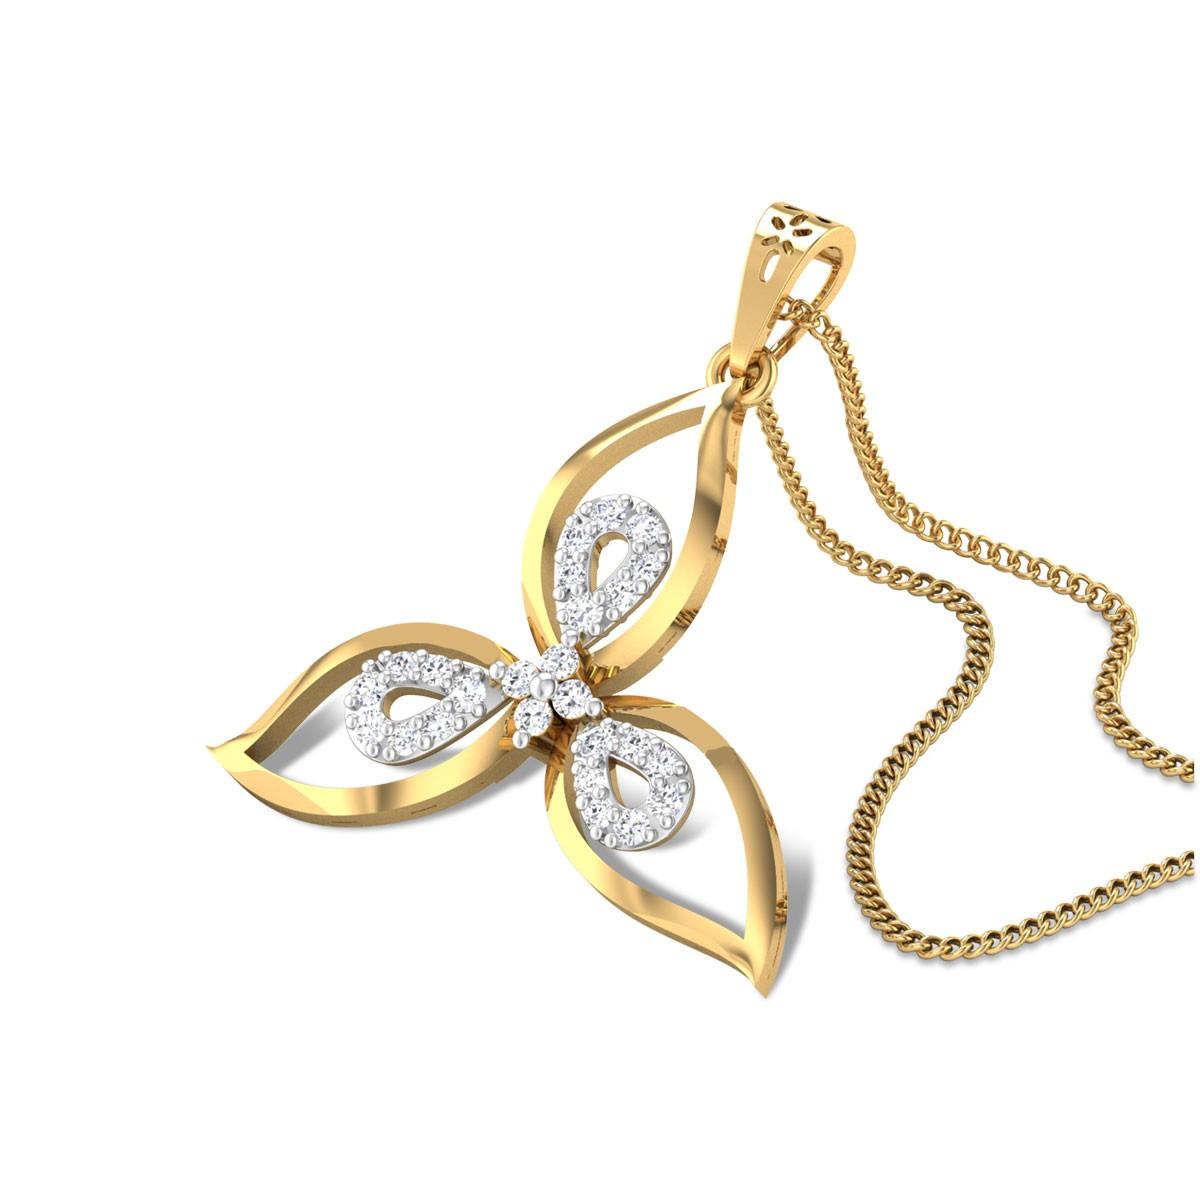 Balduino Floral Diamond Pendant